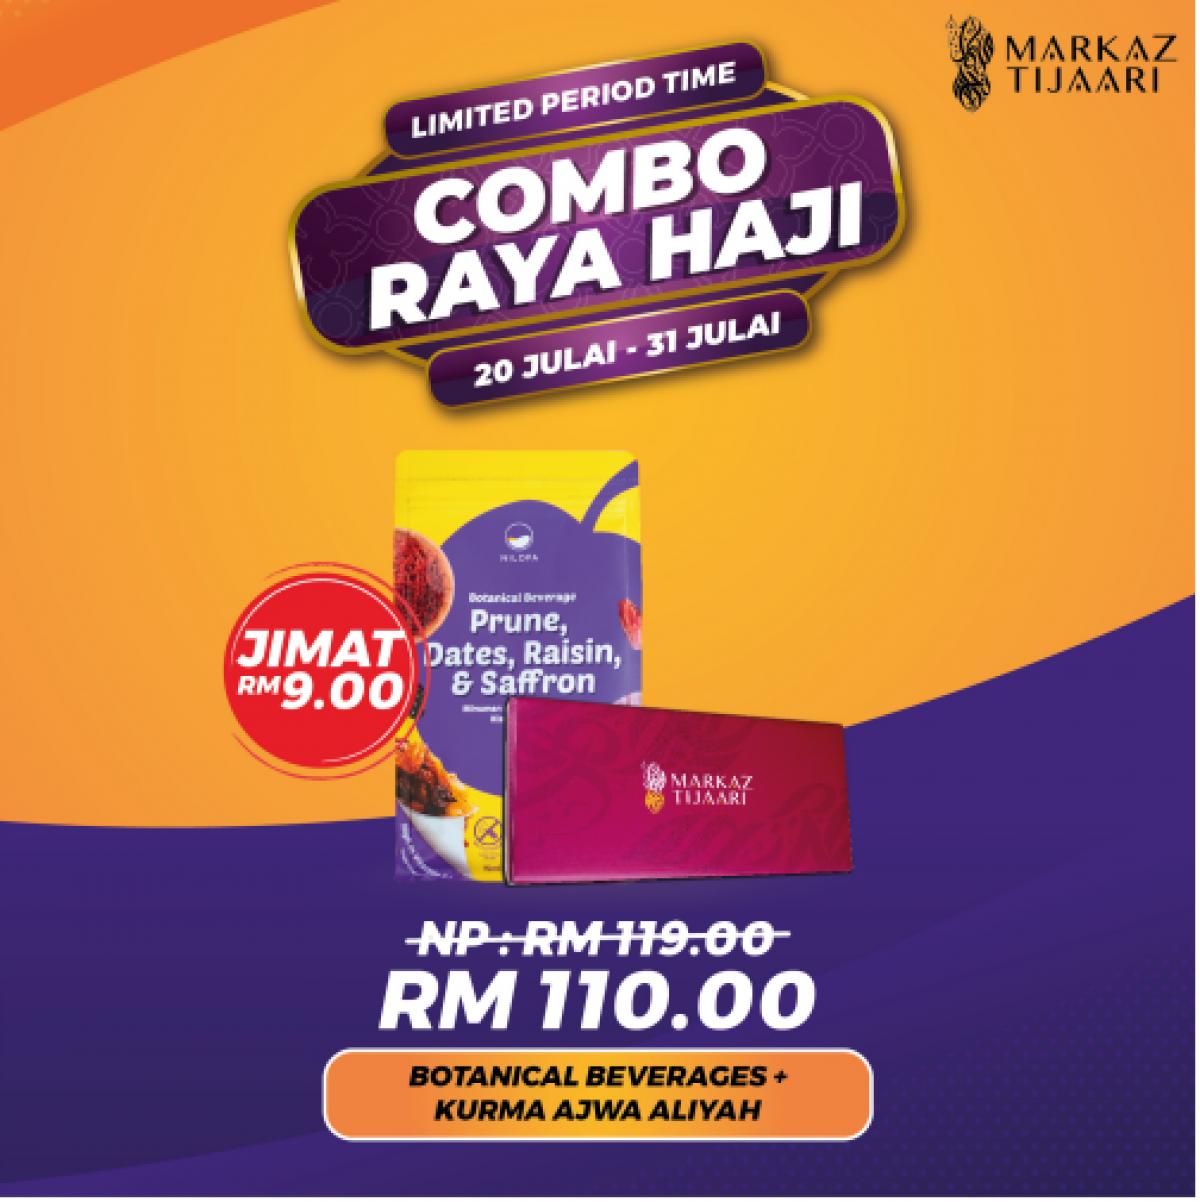 Botanical Beverages + Kurma Ajwa Aliyah Combo Raya Haji - MARKAZ TIJAARI